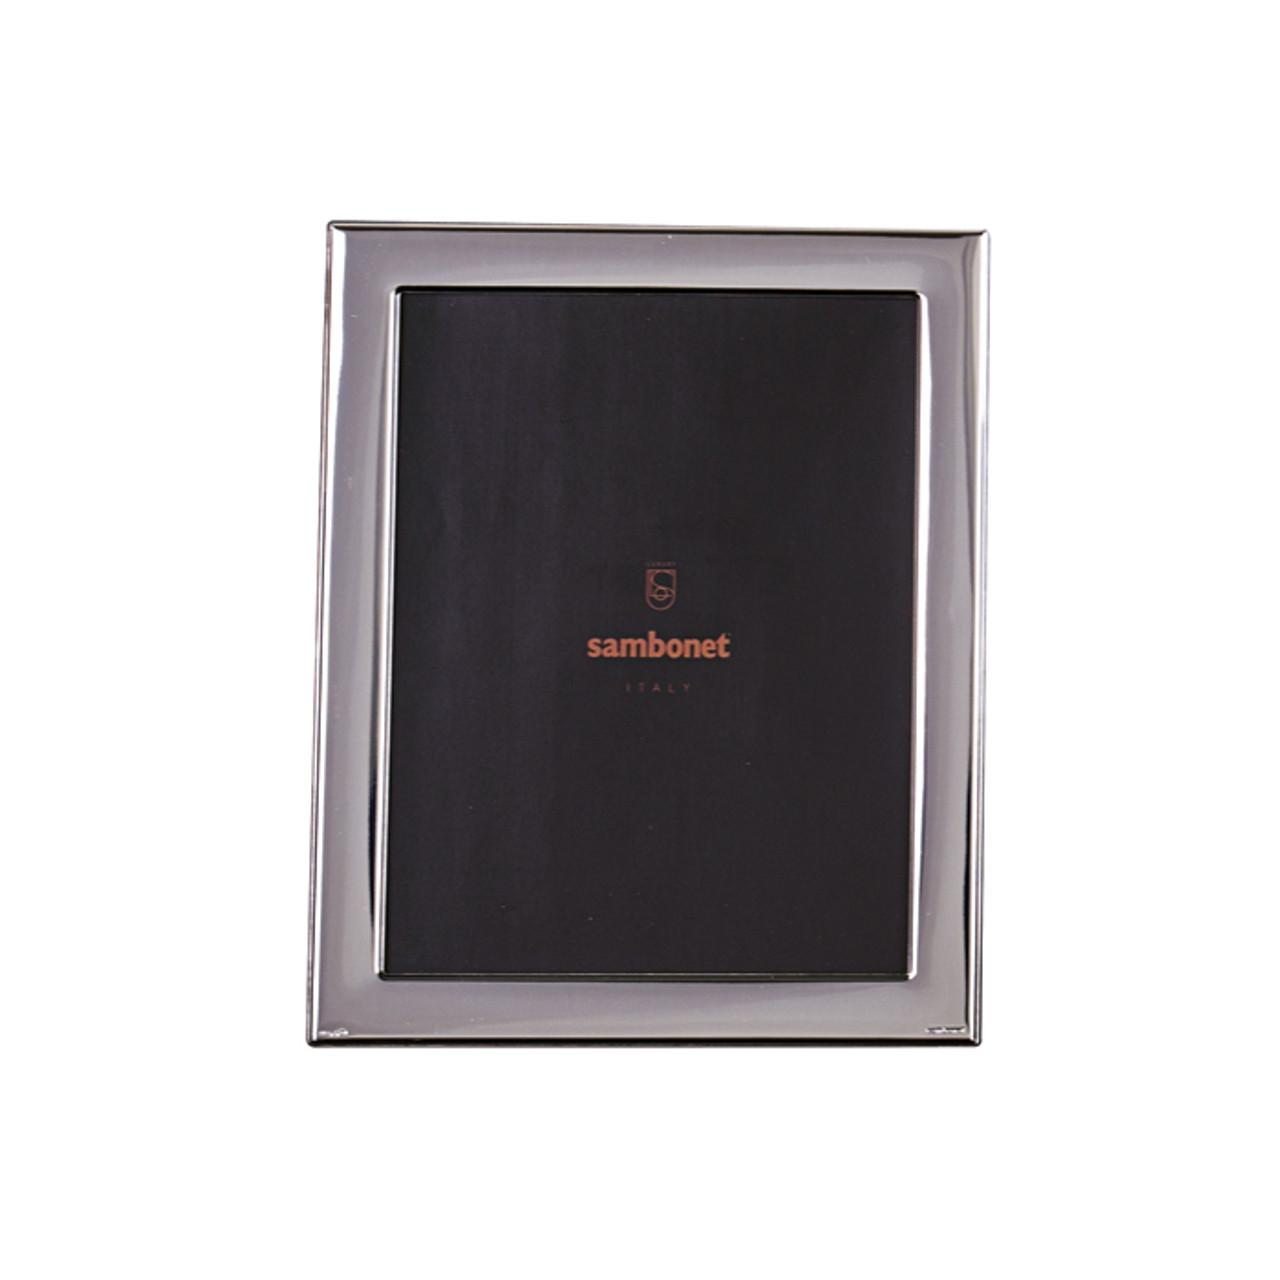 Frames Flat Frame 6 X 8 Inch Sambonet Online Store